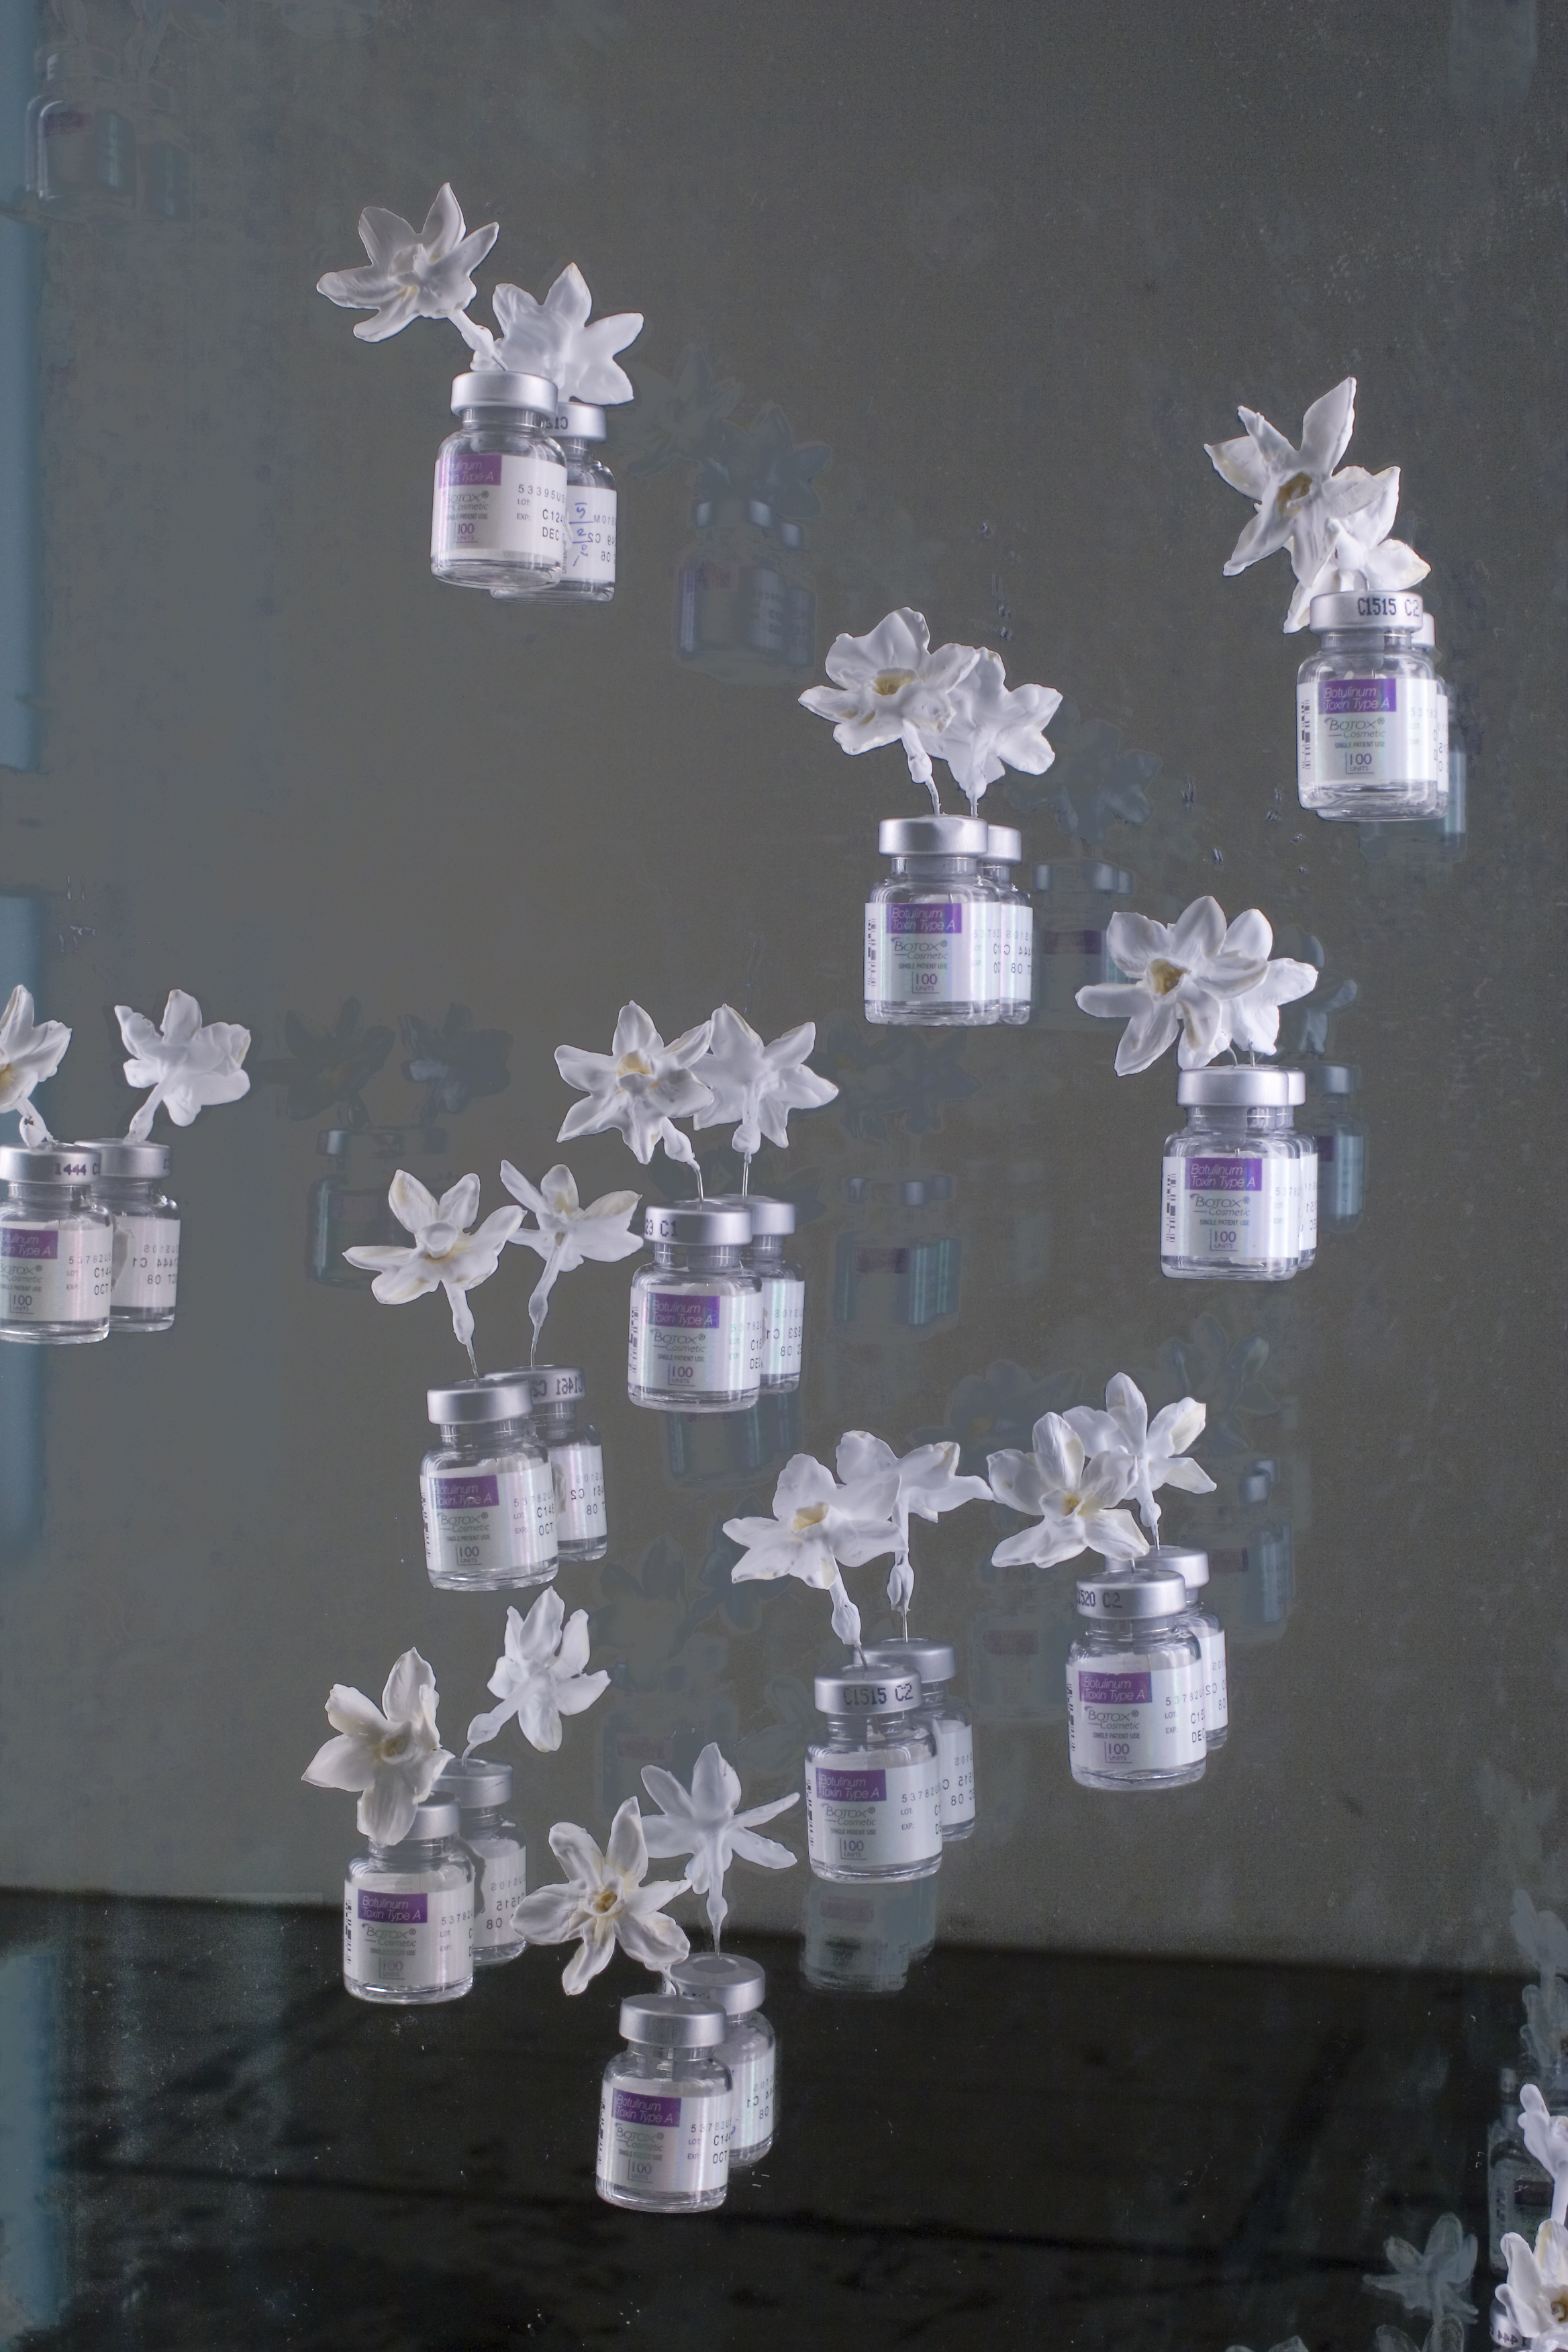 The Gaze I  (detail), 2007  Steel, glass, encaustic, narcissus flowers, Botox vials, fluorescents, plexiglass  73 x 30 x 6 inches